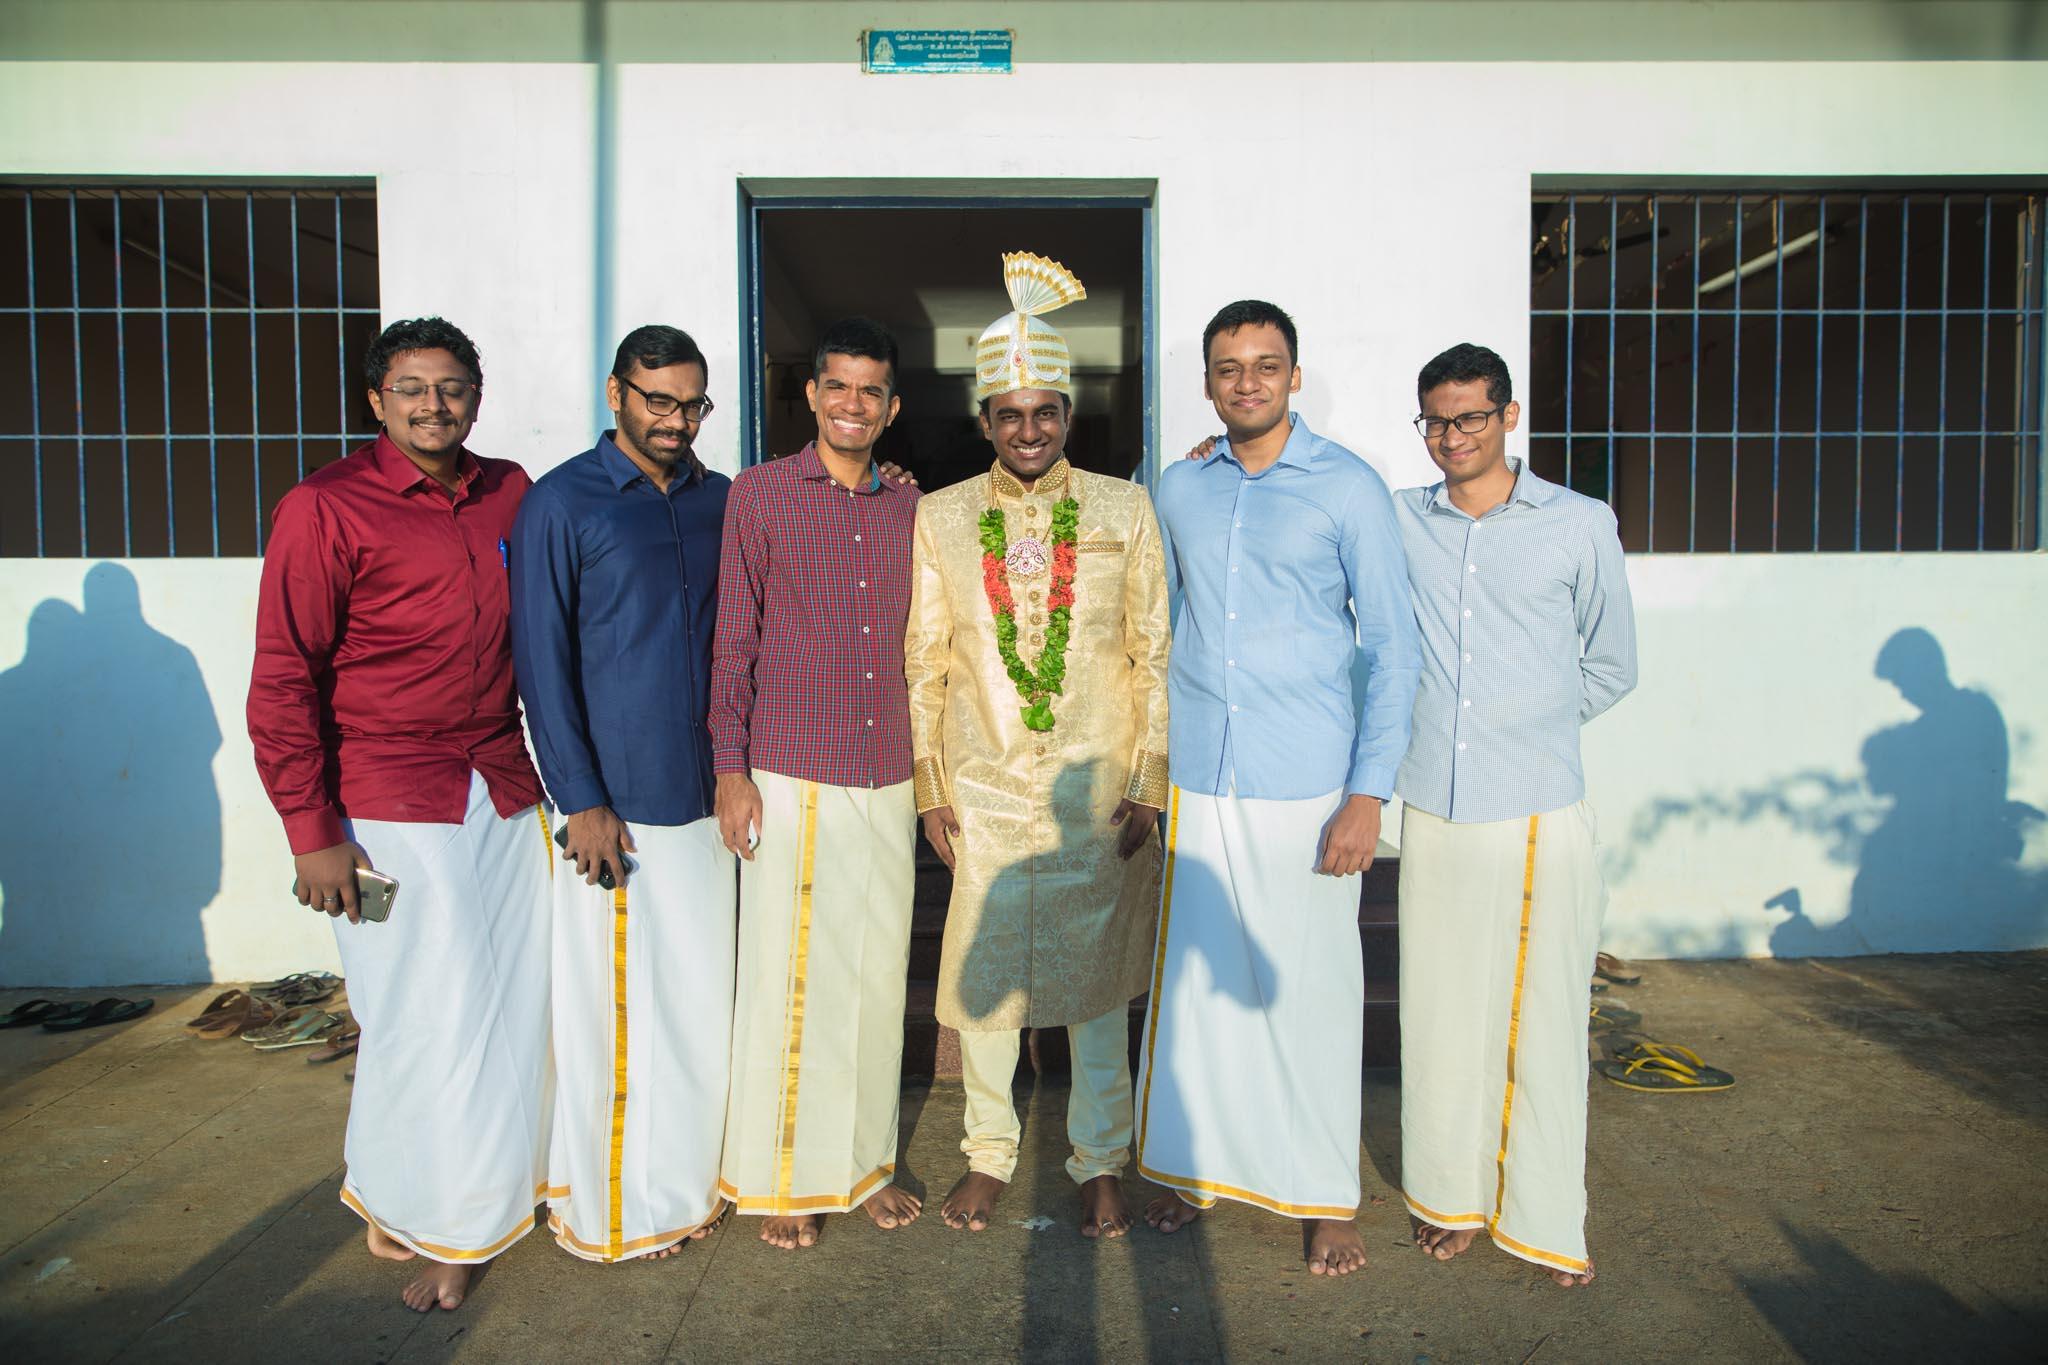 karaikudi-chettinad-wedding-photos7